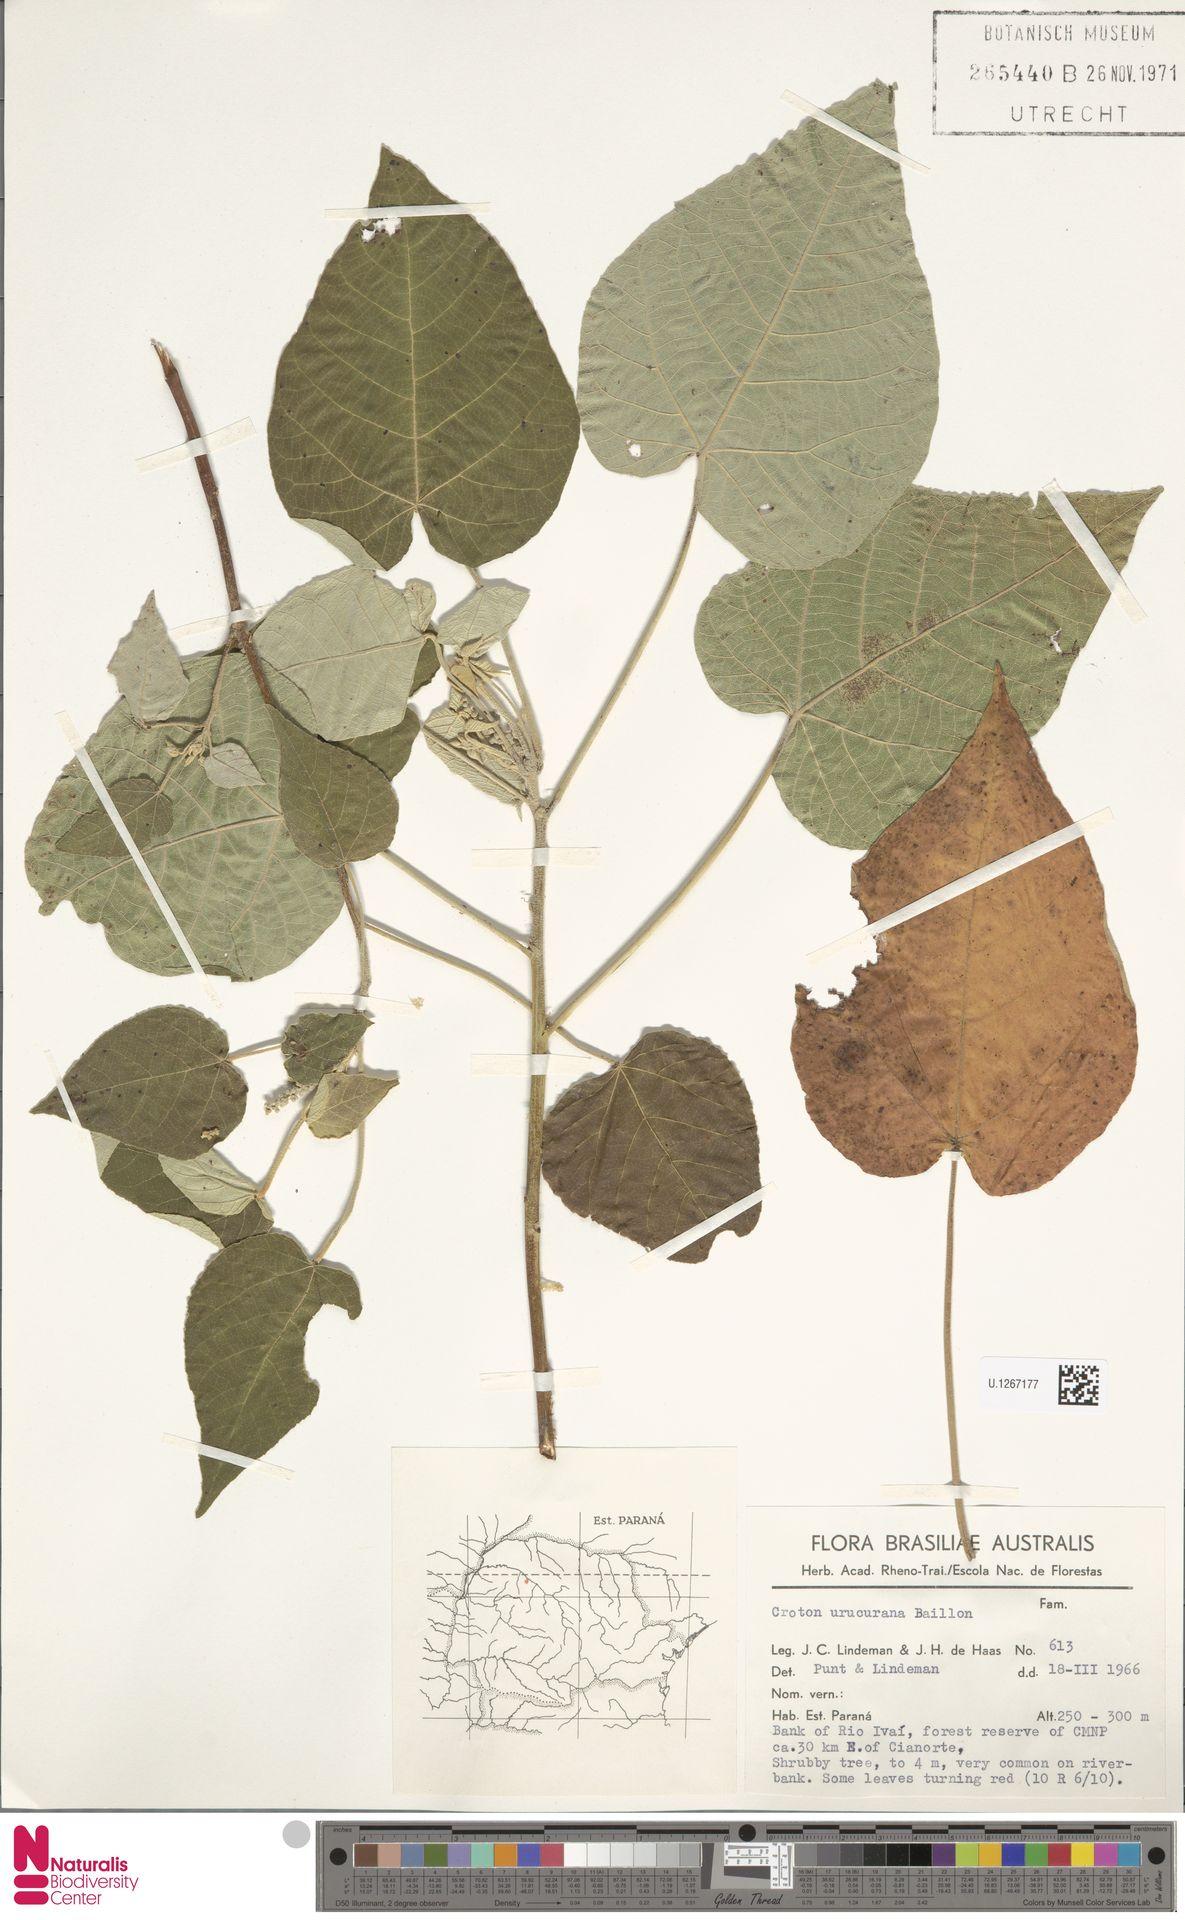 U.1267177 | Croton urucurana Baill.